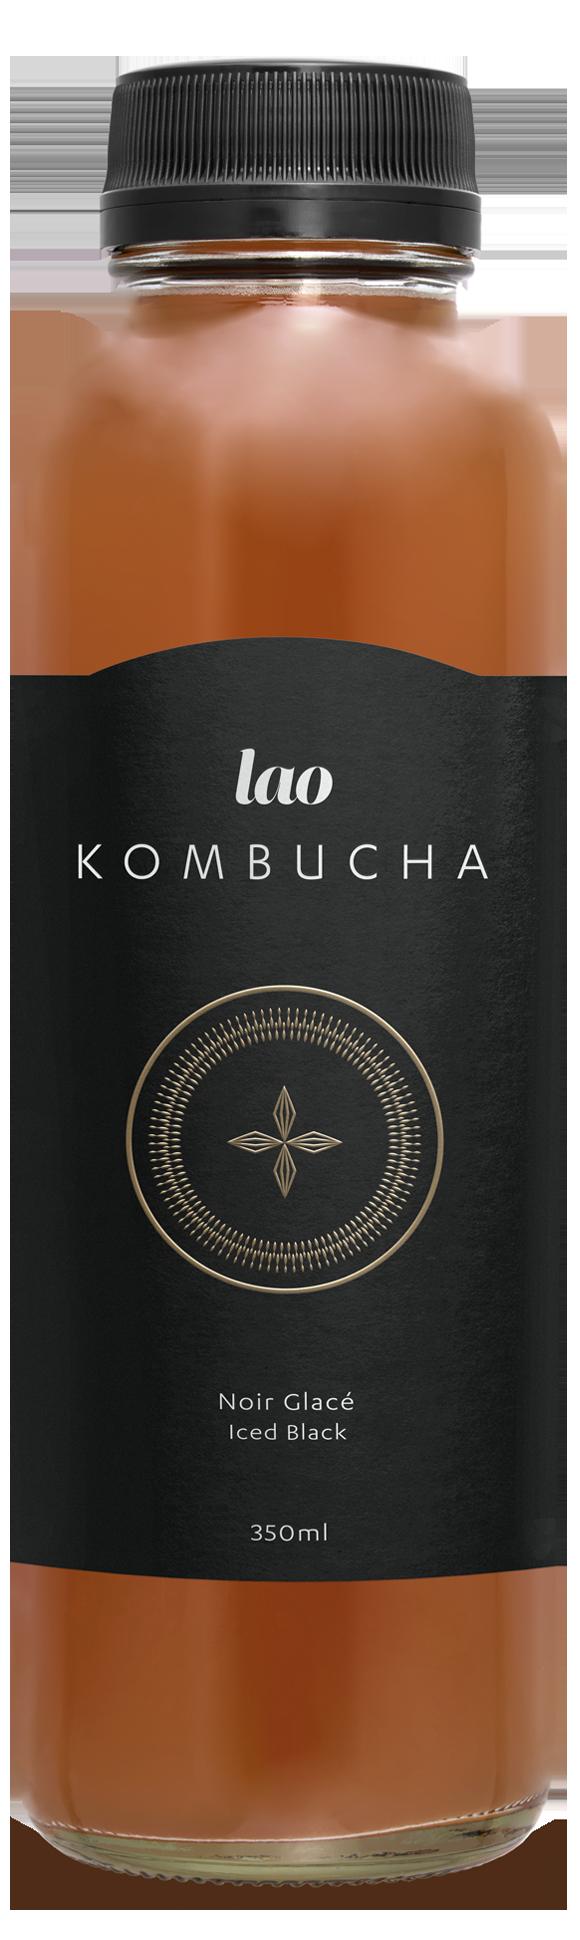 Natural Kombucha, black tea, original kombucha, Camellia sinensis, Quebec, Montreal, Authentic, premium, best kombucha, canada